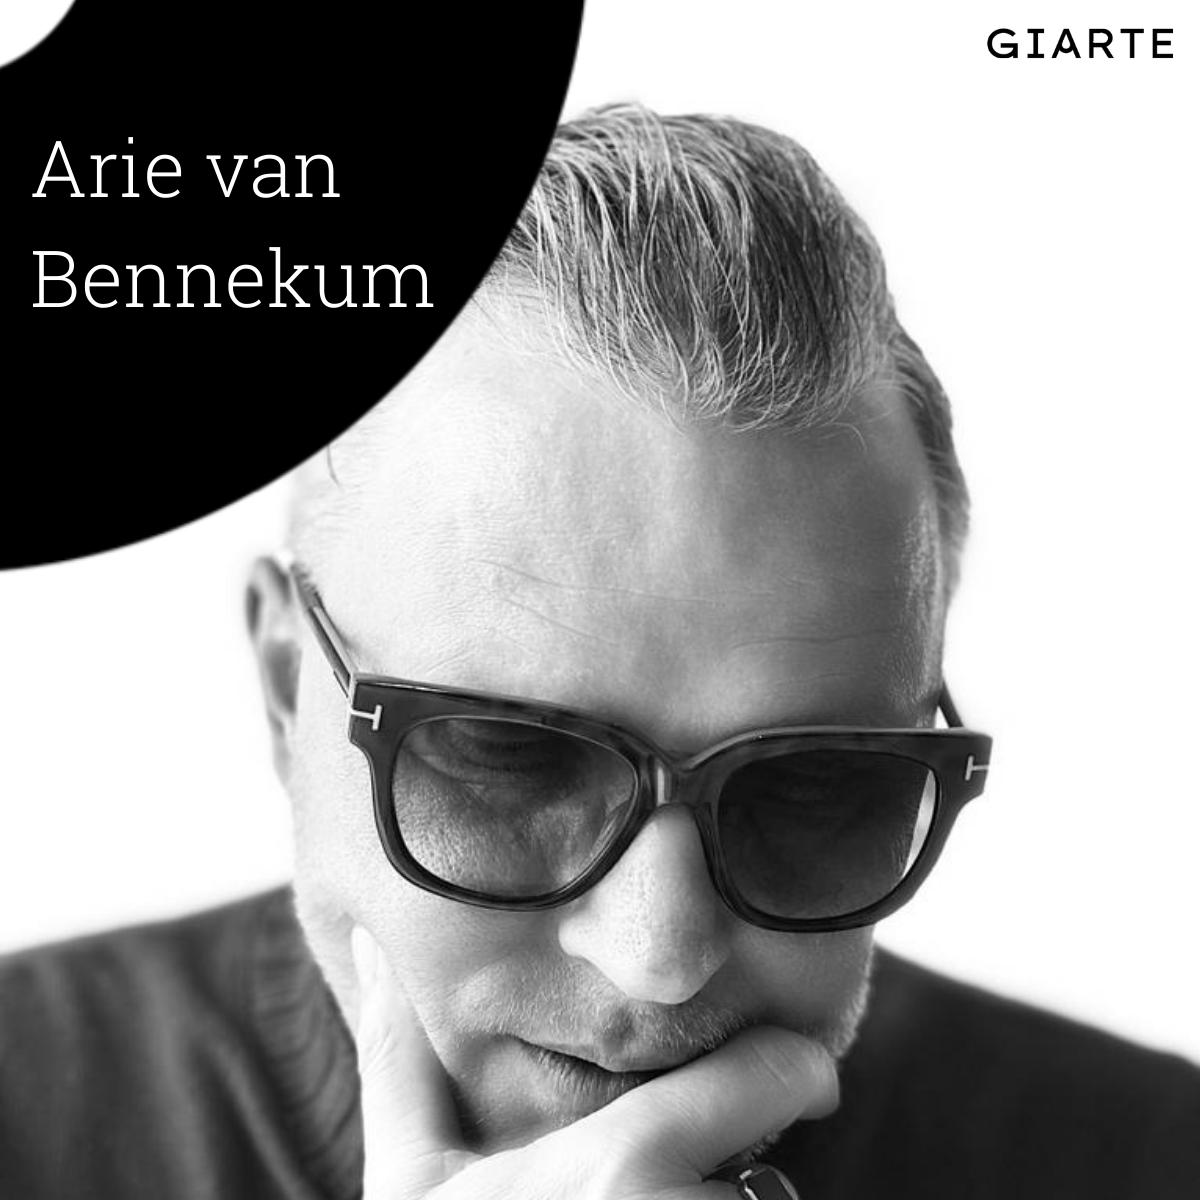 Agnostic Agile with Arie van Bennekum (Dutch)